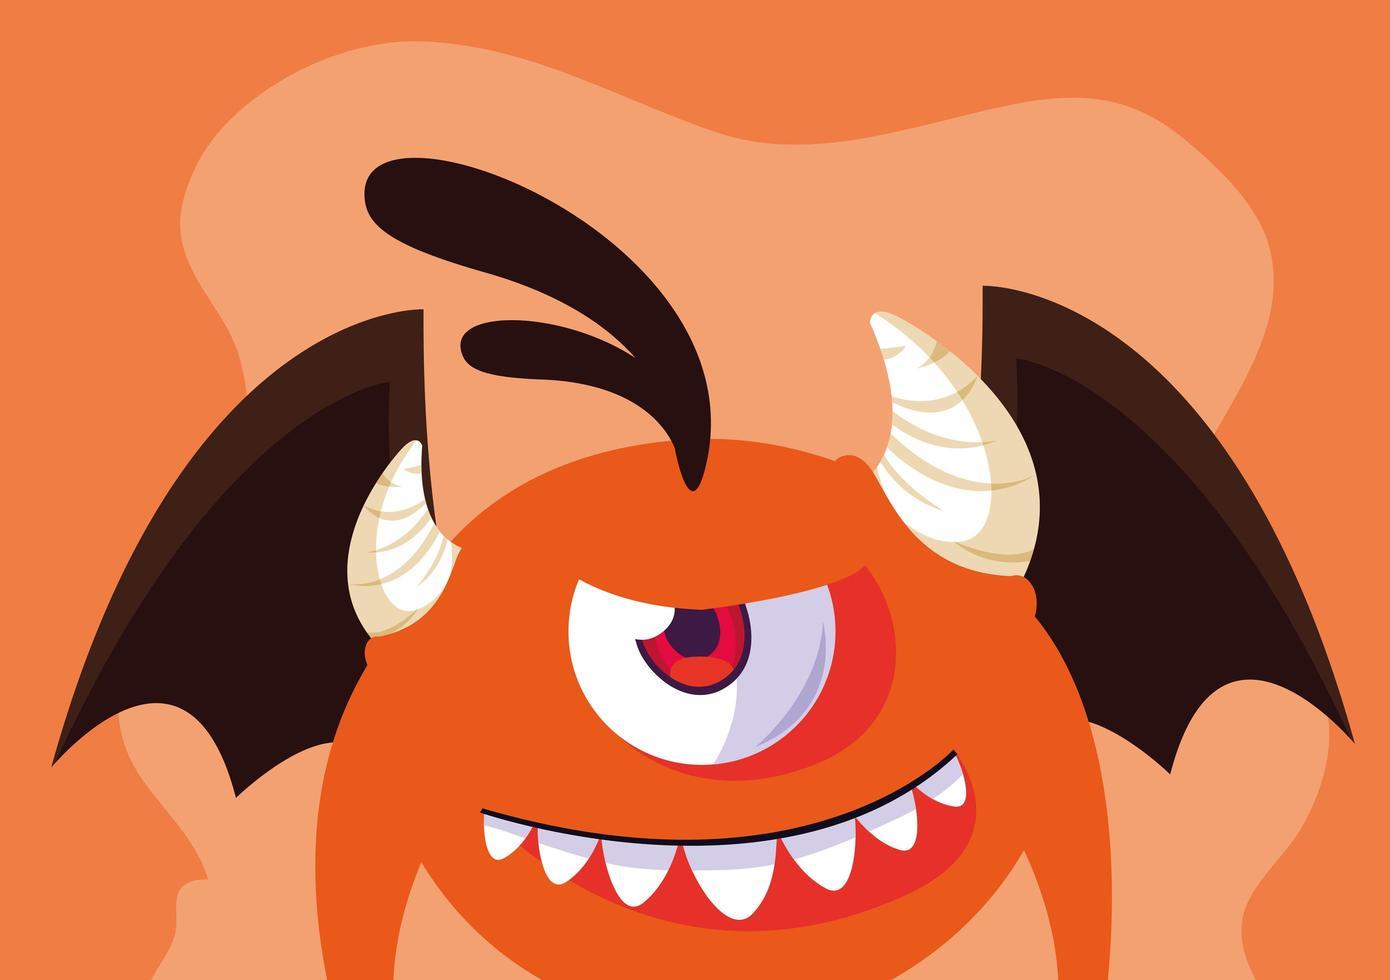 Orange monster cartoon design icon vector